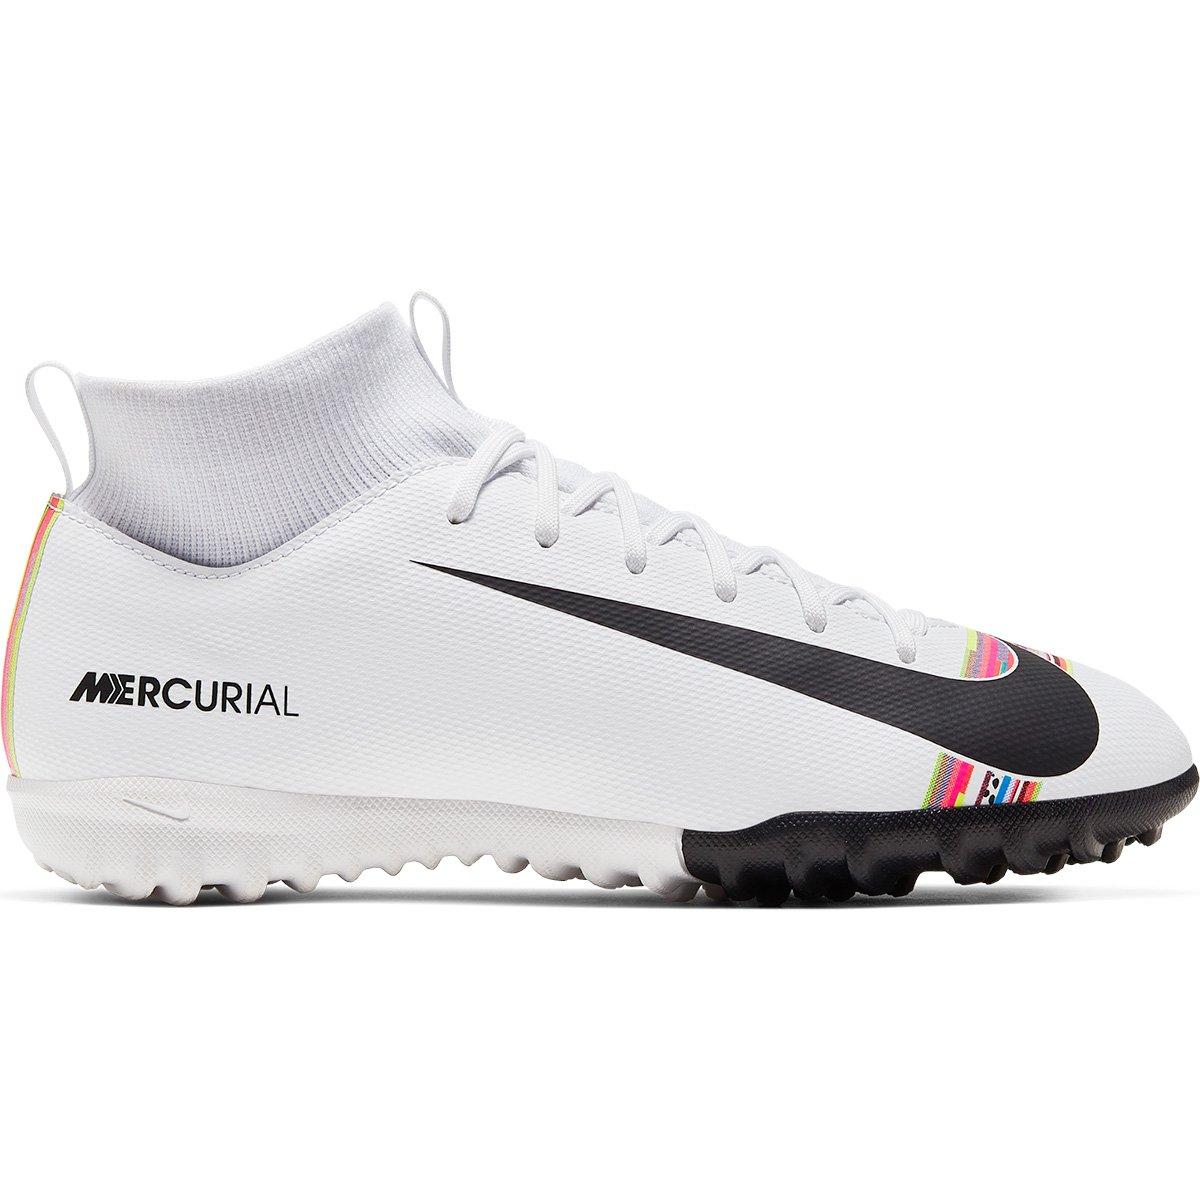 3f47d497f7b3f Chuteira Society Infantil Nike Mercurial Superfly 6 Academy GS CR7 TF -  Branco e Preto | Loja do Inter